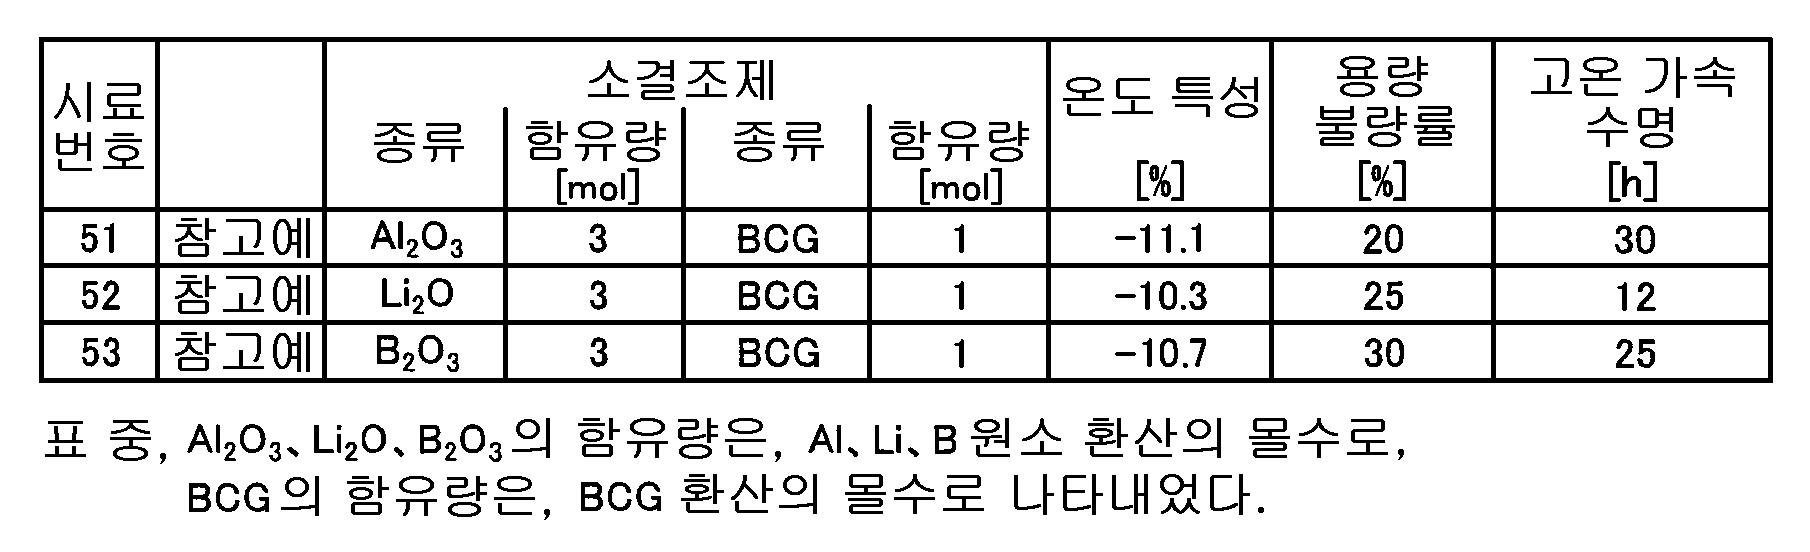 Figure 112006023309524-pat00006